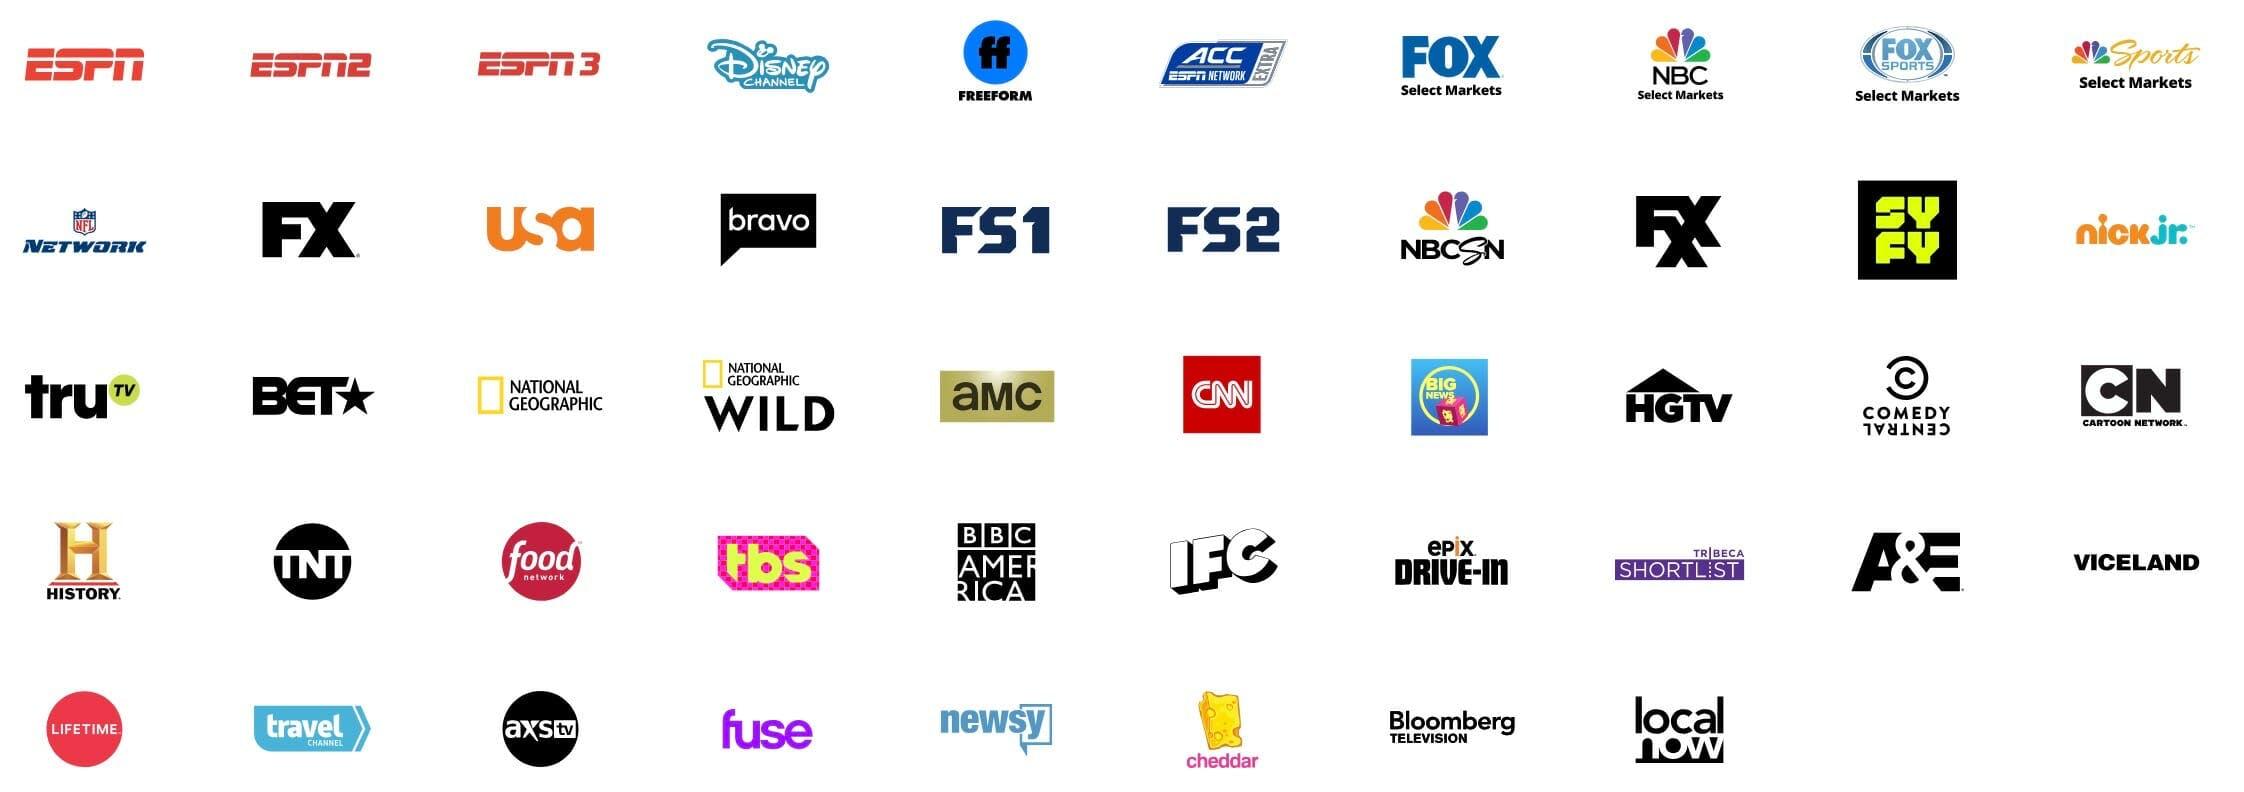 stream nfl games today on tv week 13 - sling orange + blue